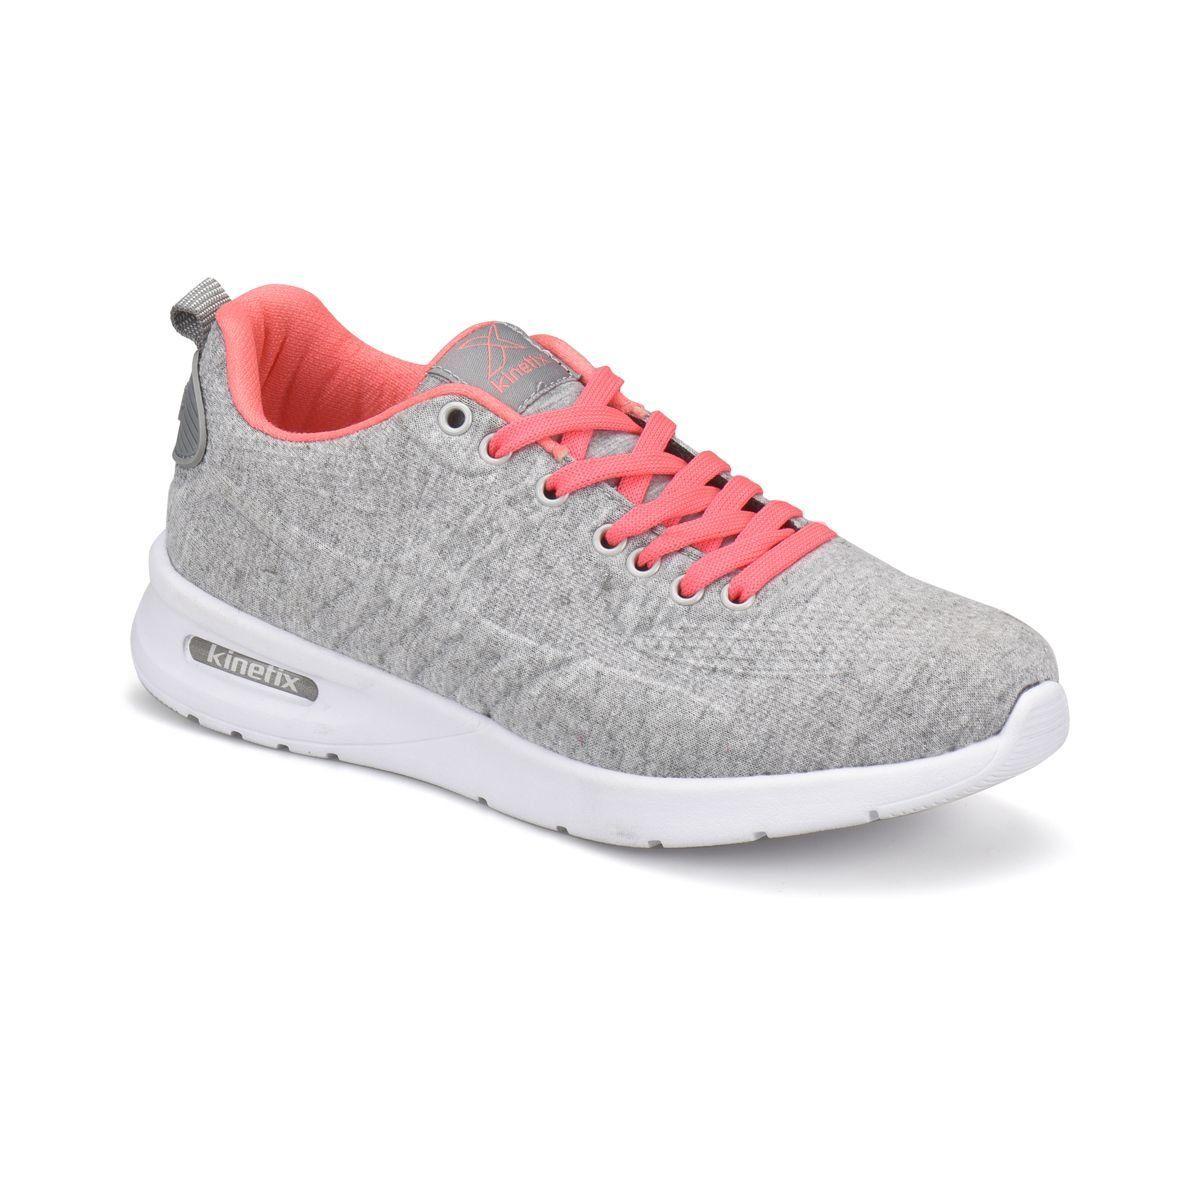 Kinetix Gri Mel Kadin Sneaker Ss18 Newseason Summer Spring Shop Shopping Fashion Sneaker Gri Ayakkabilar